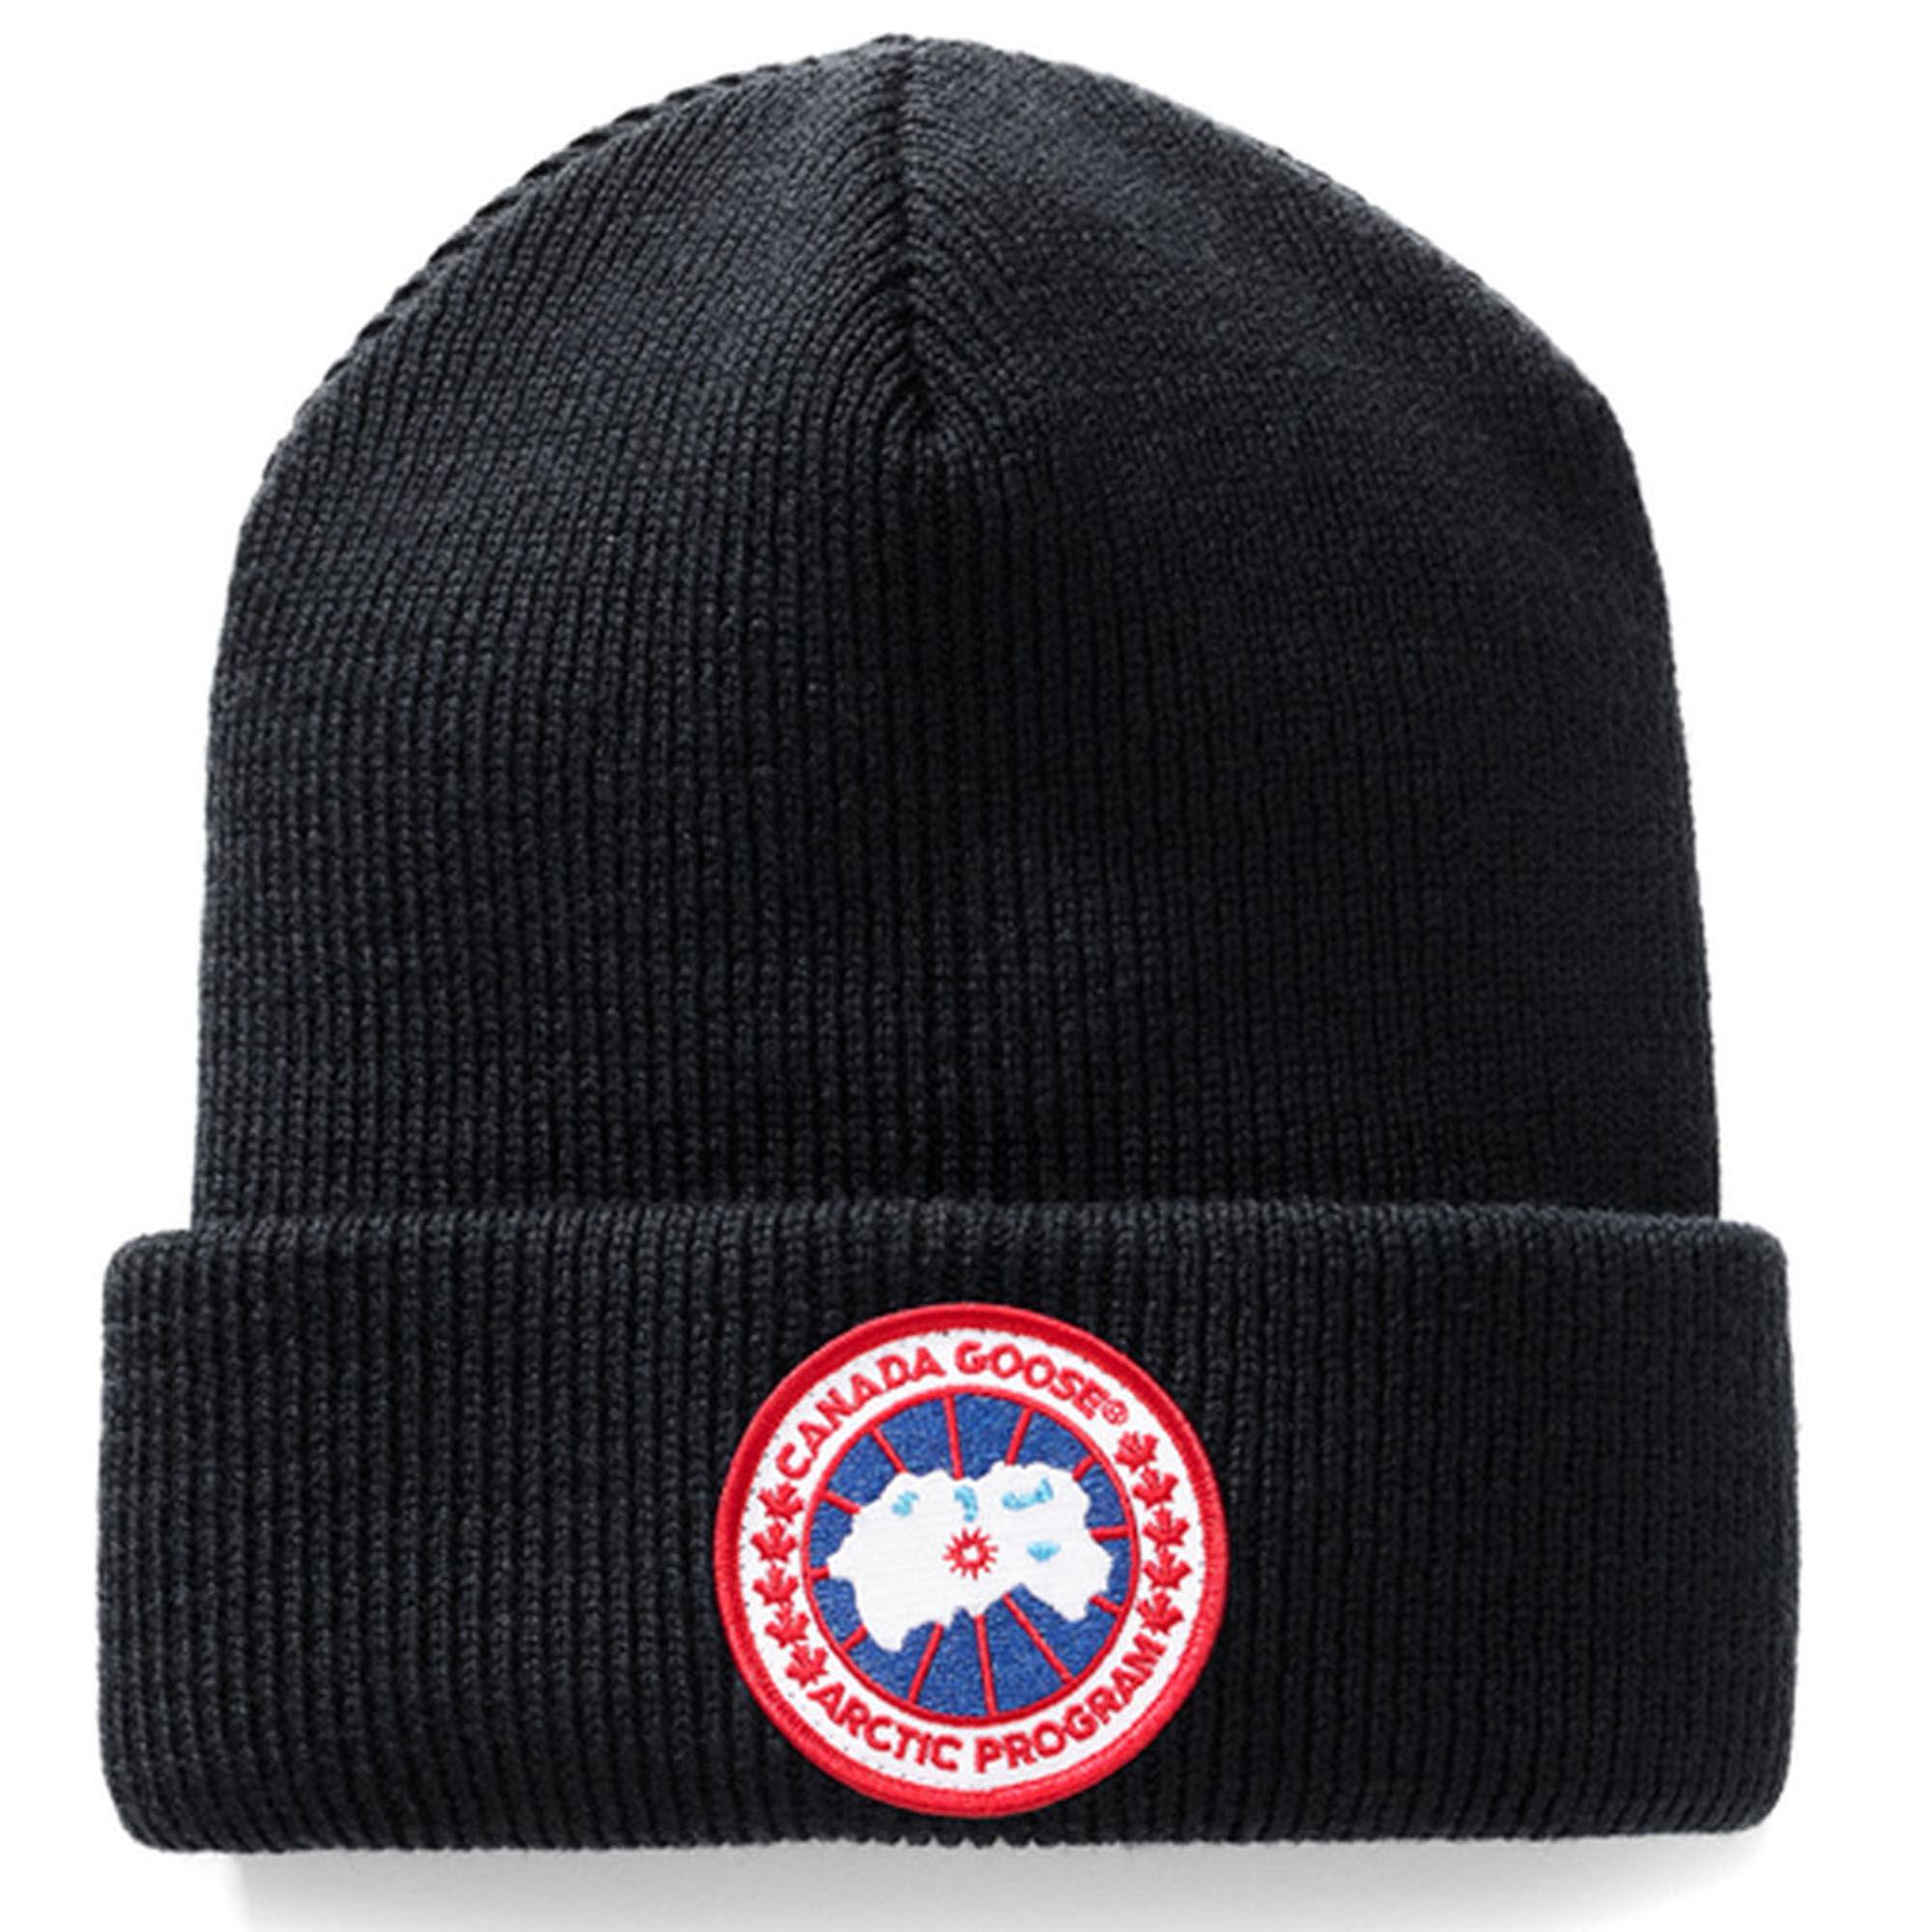 ski barn canada goose